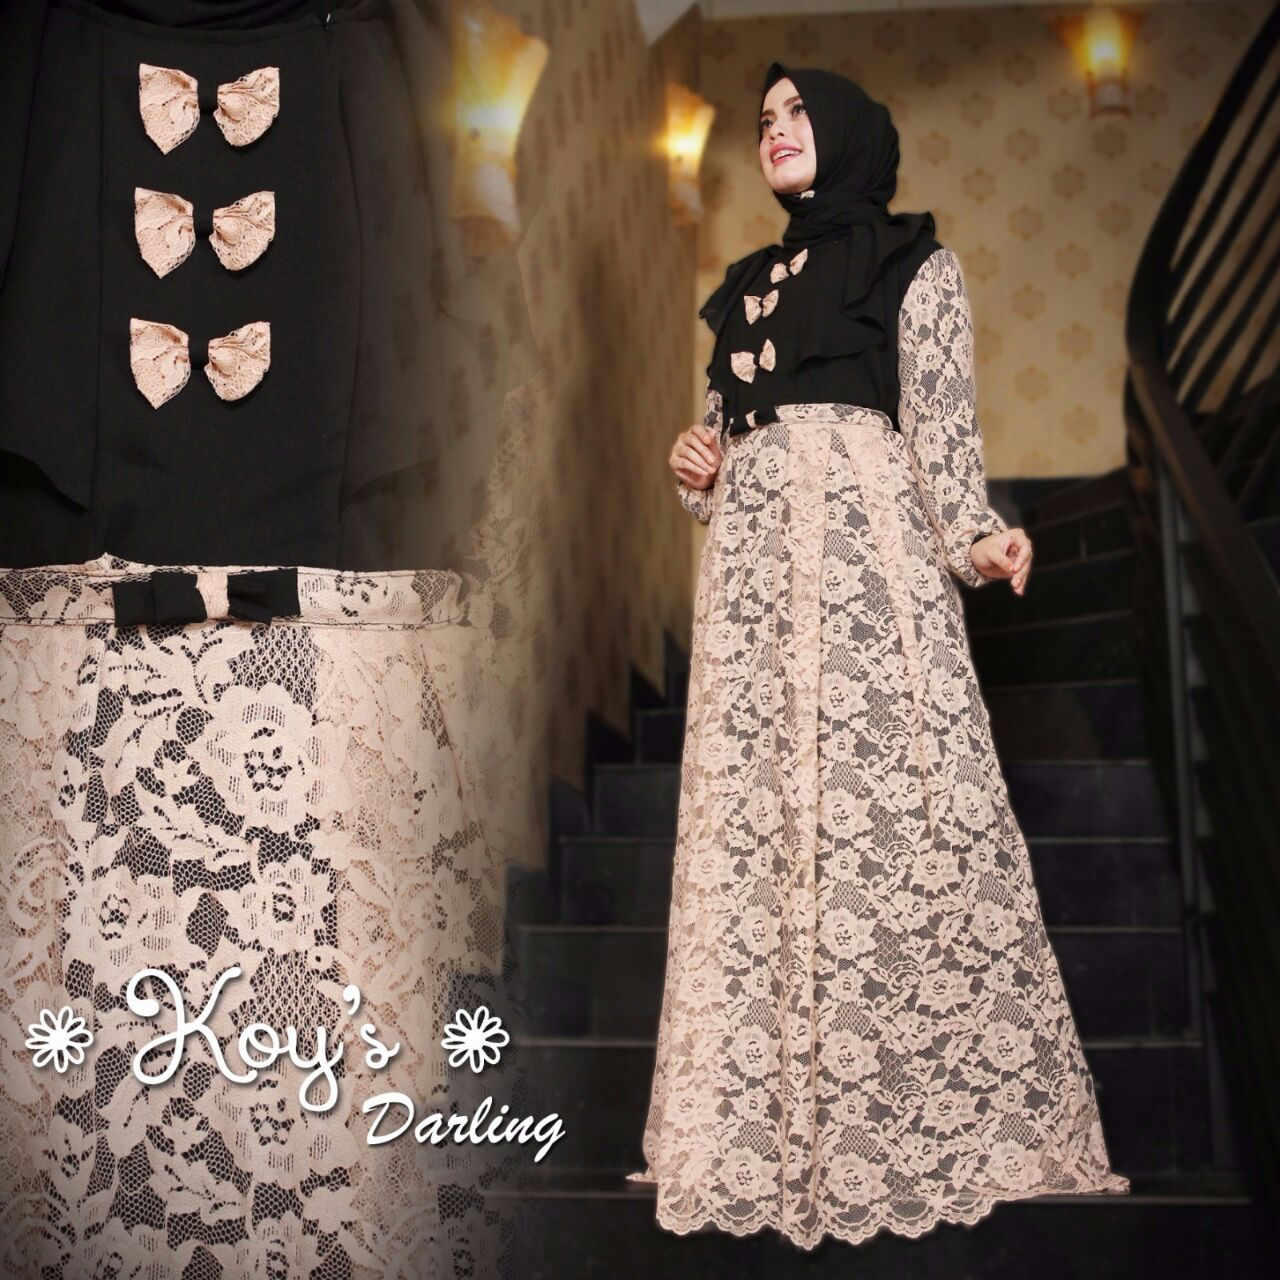 Jual Baju Hijab Di Surabaya Darling Dress By Koy 39 S